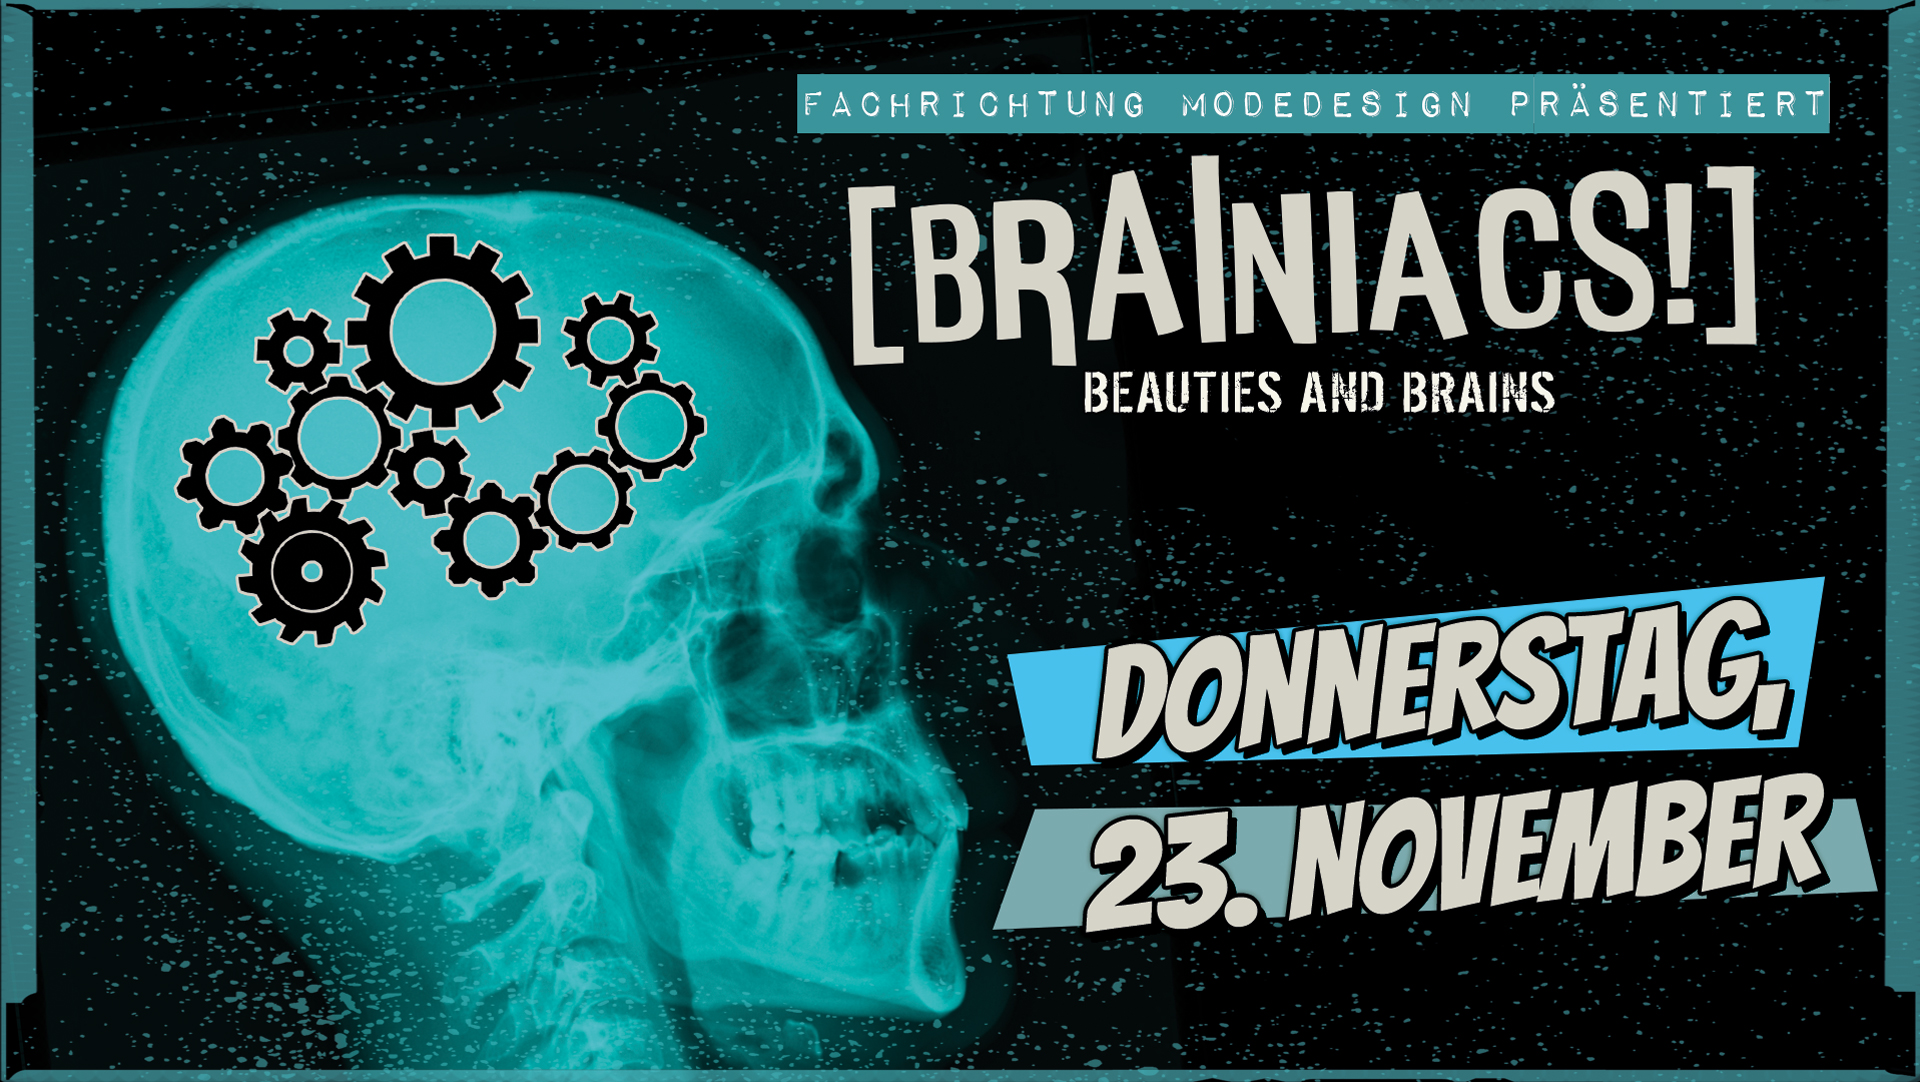 Brainiacs Beauties and Brains